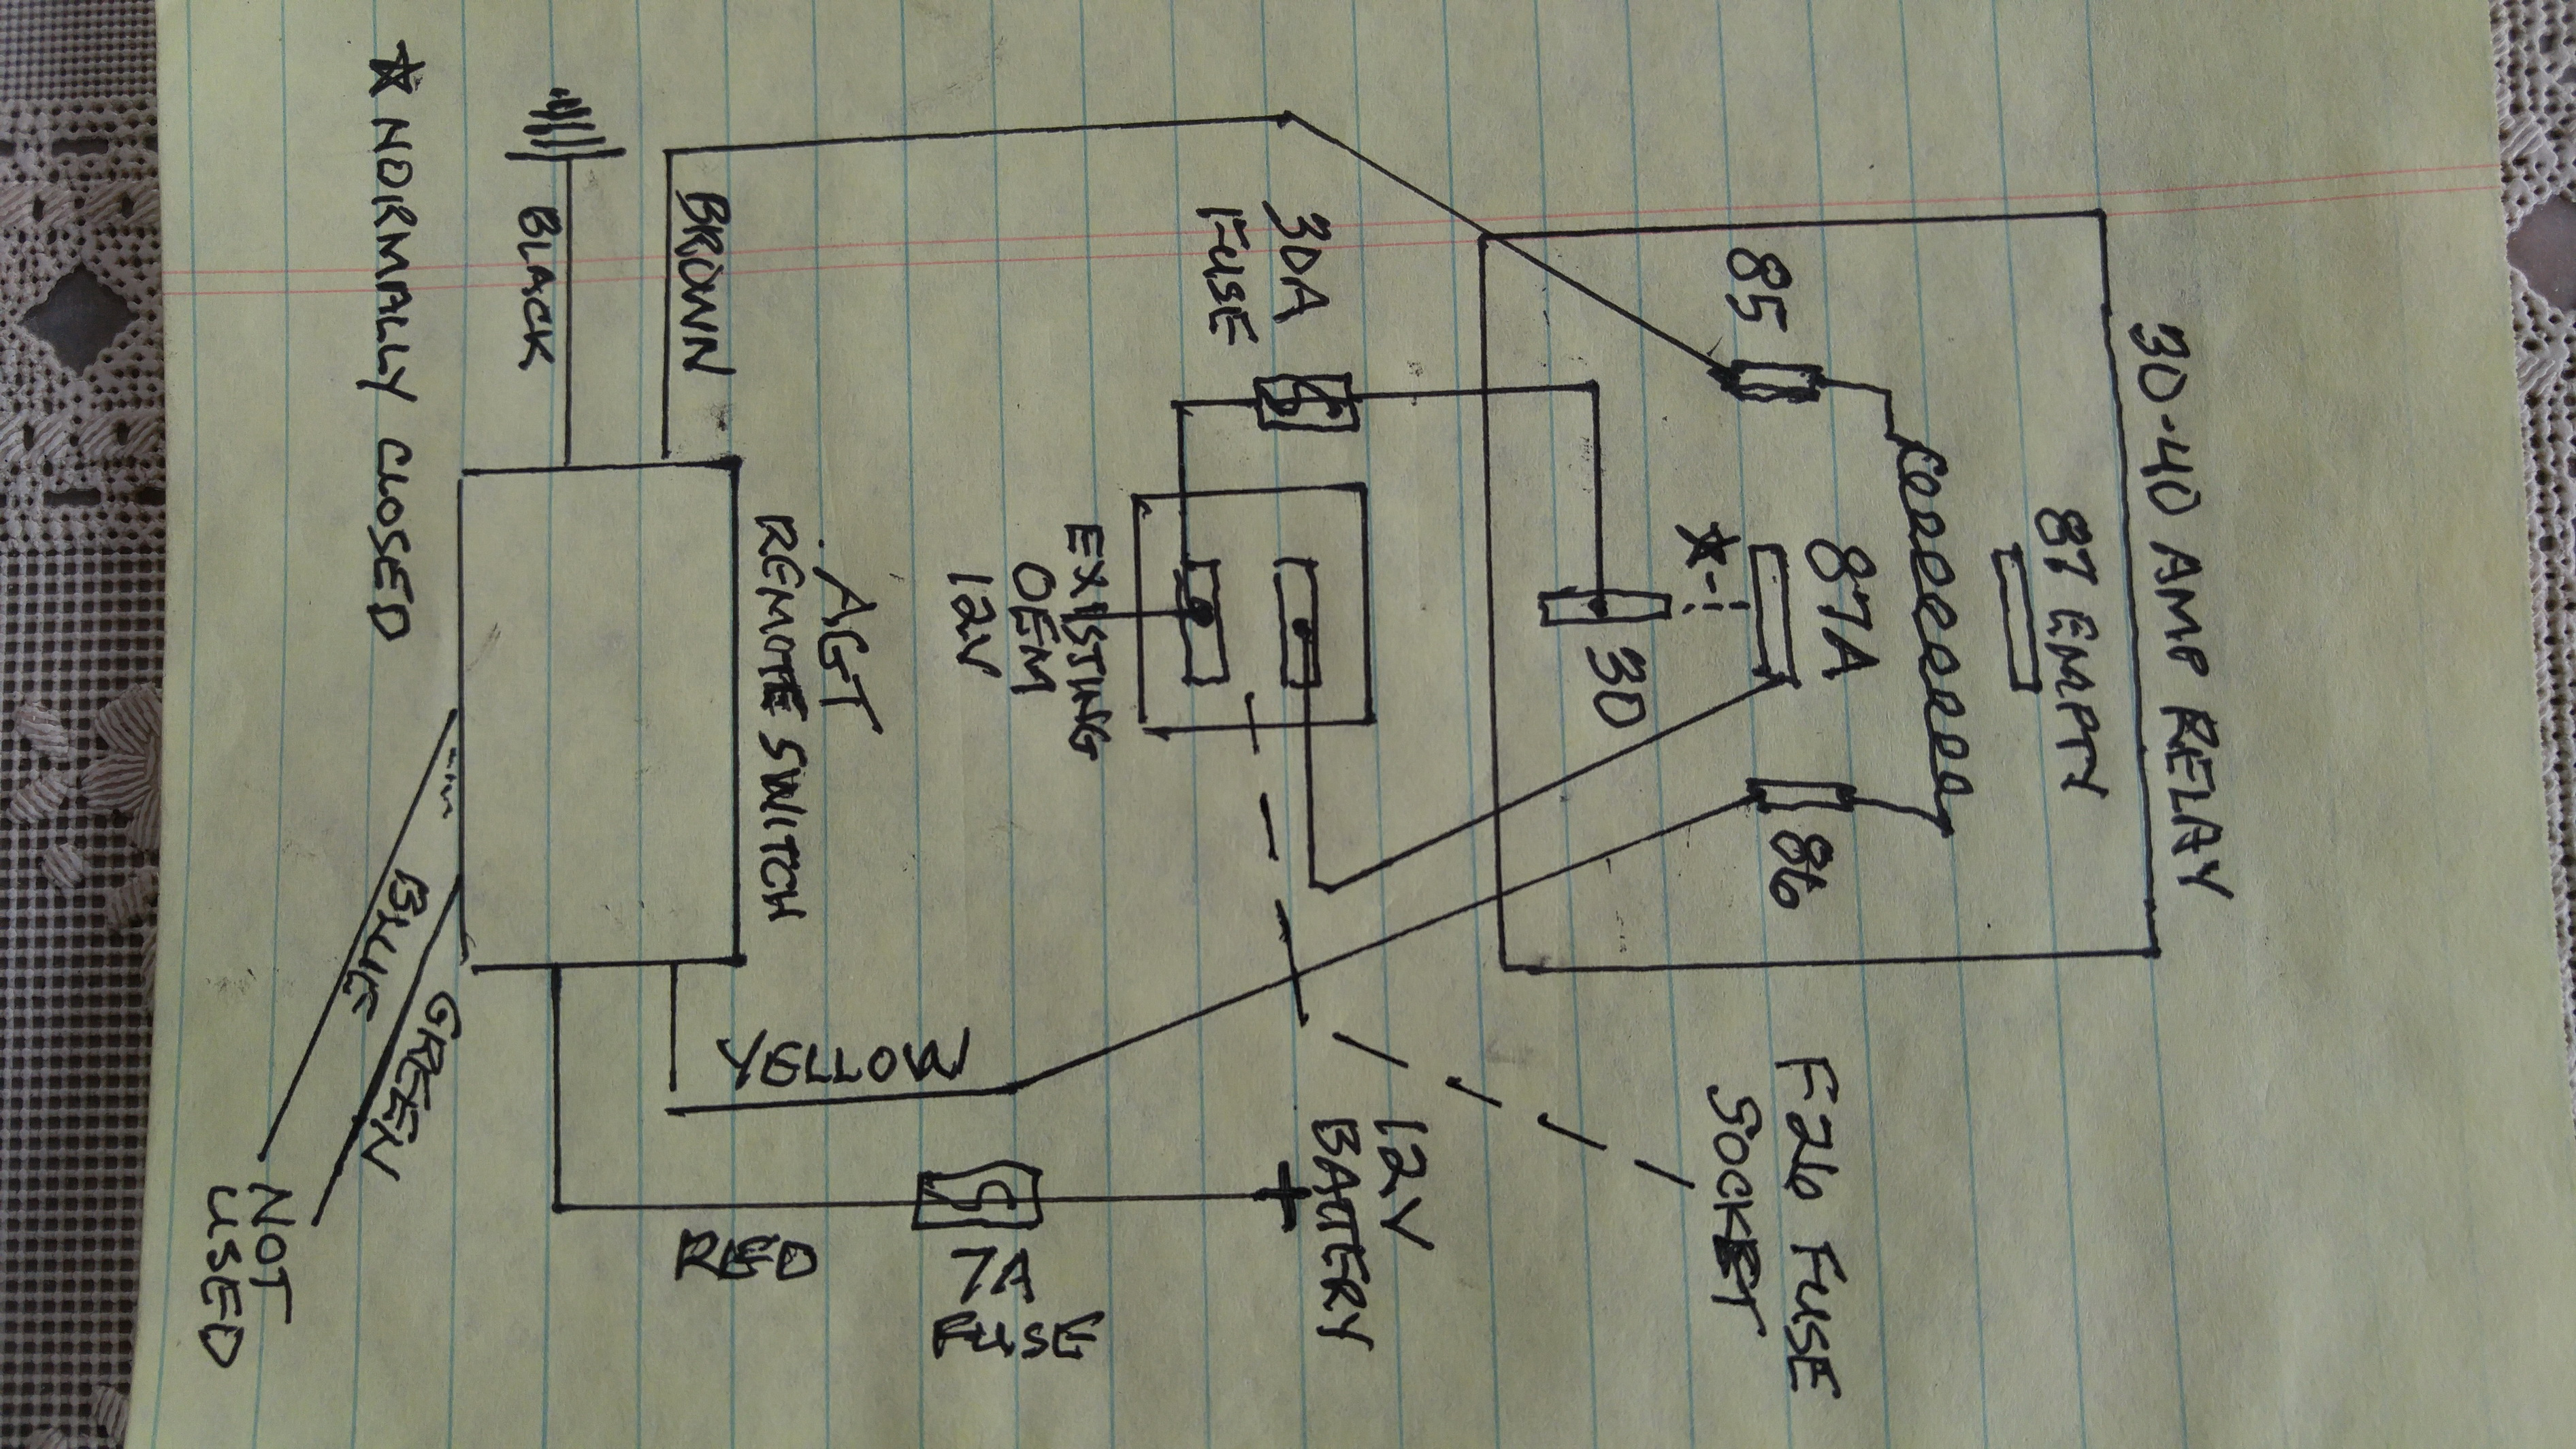 Horn Wiring Diagram 55 Dodge Classicoldsmobilecom